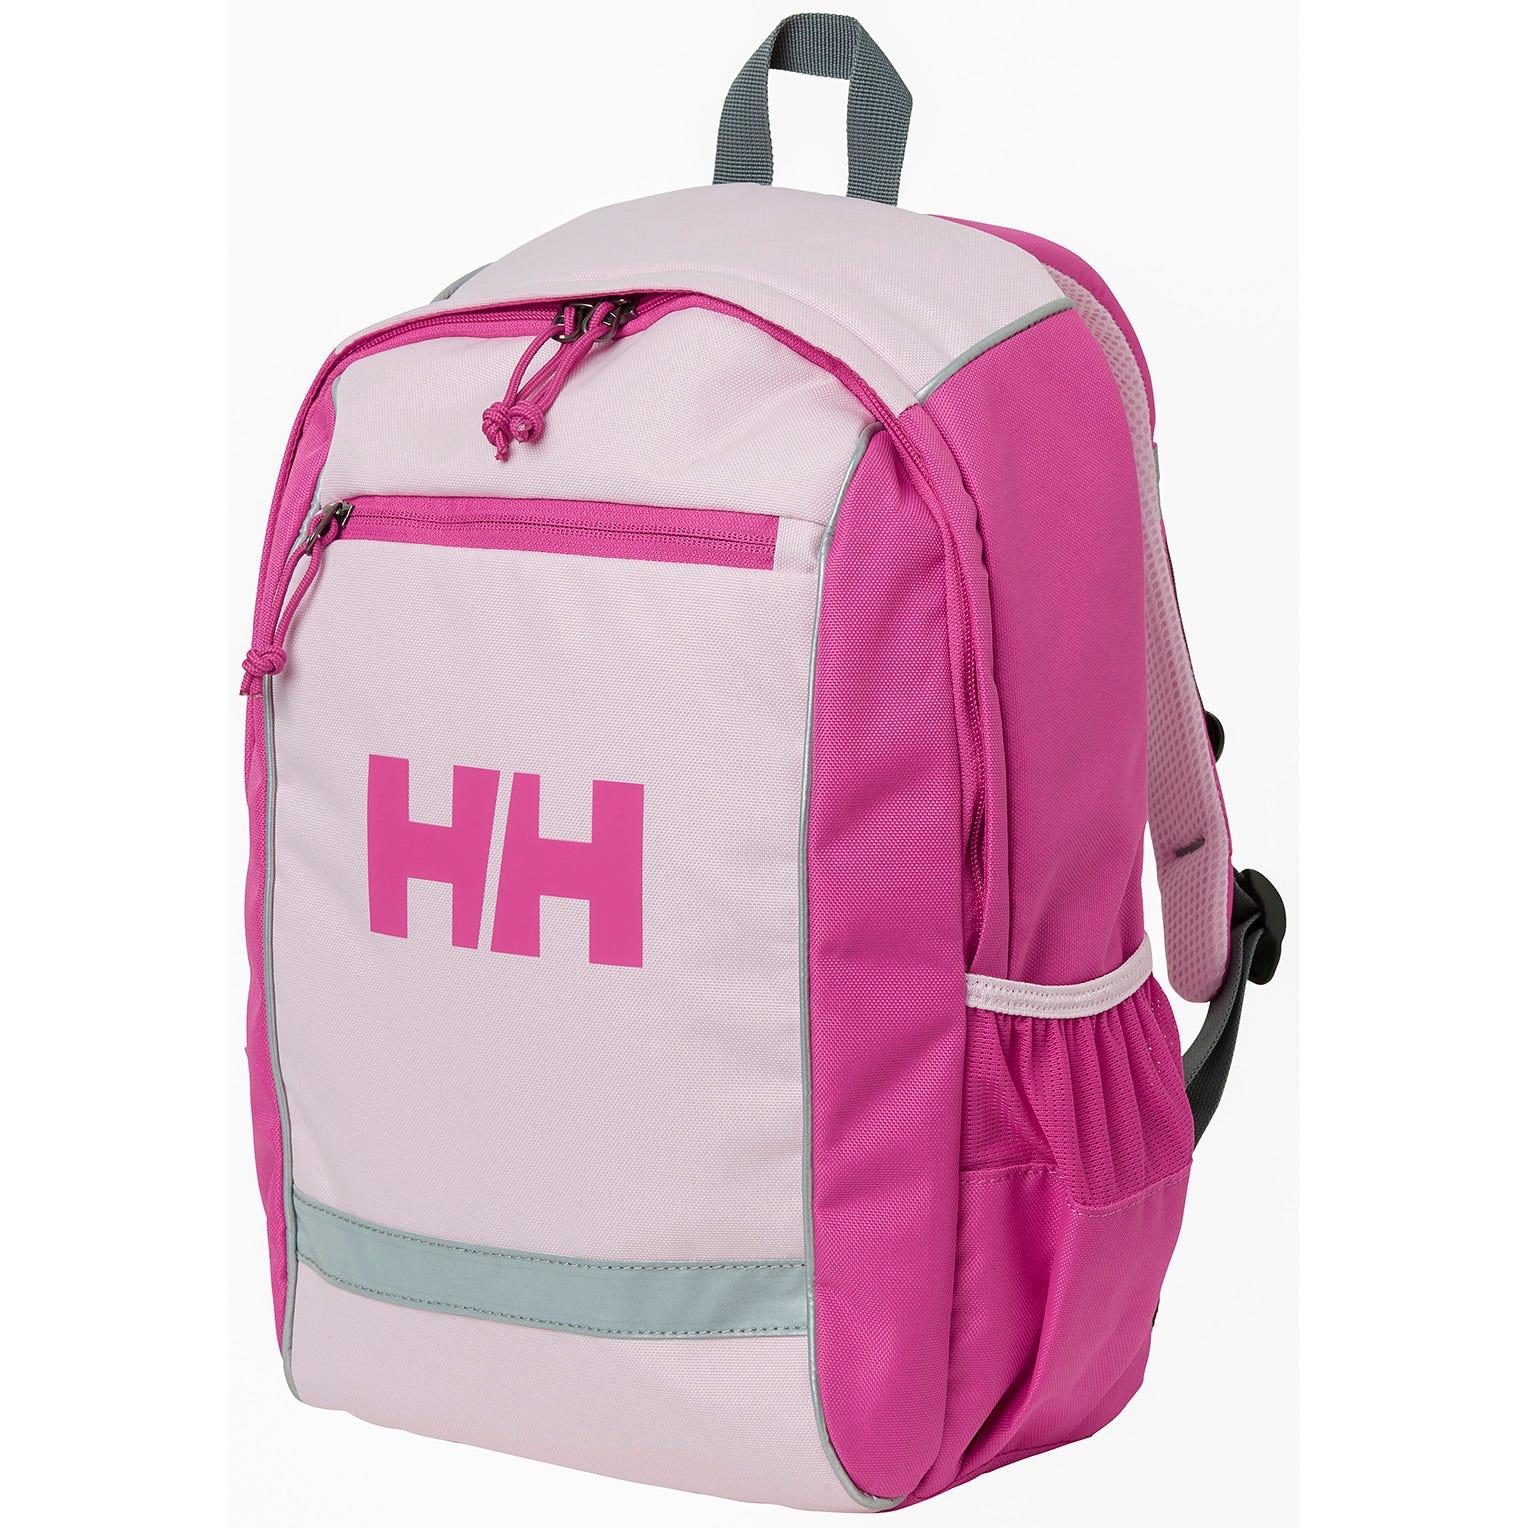 Helly Hansen Hopalong R/ücksack Mochila infantil Unisex ni/ños